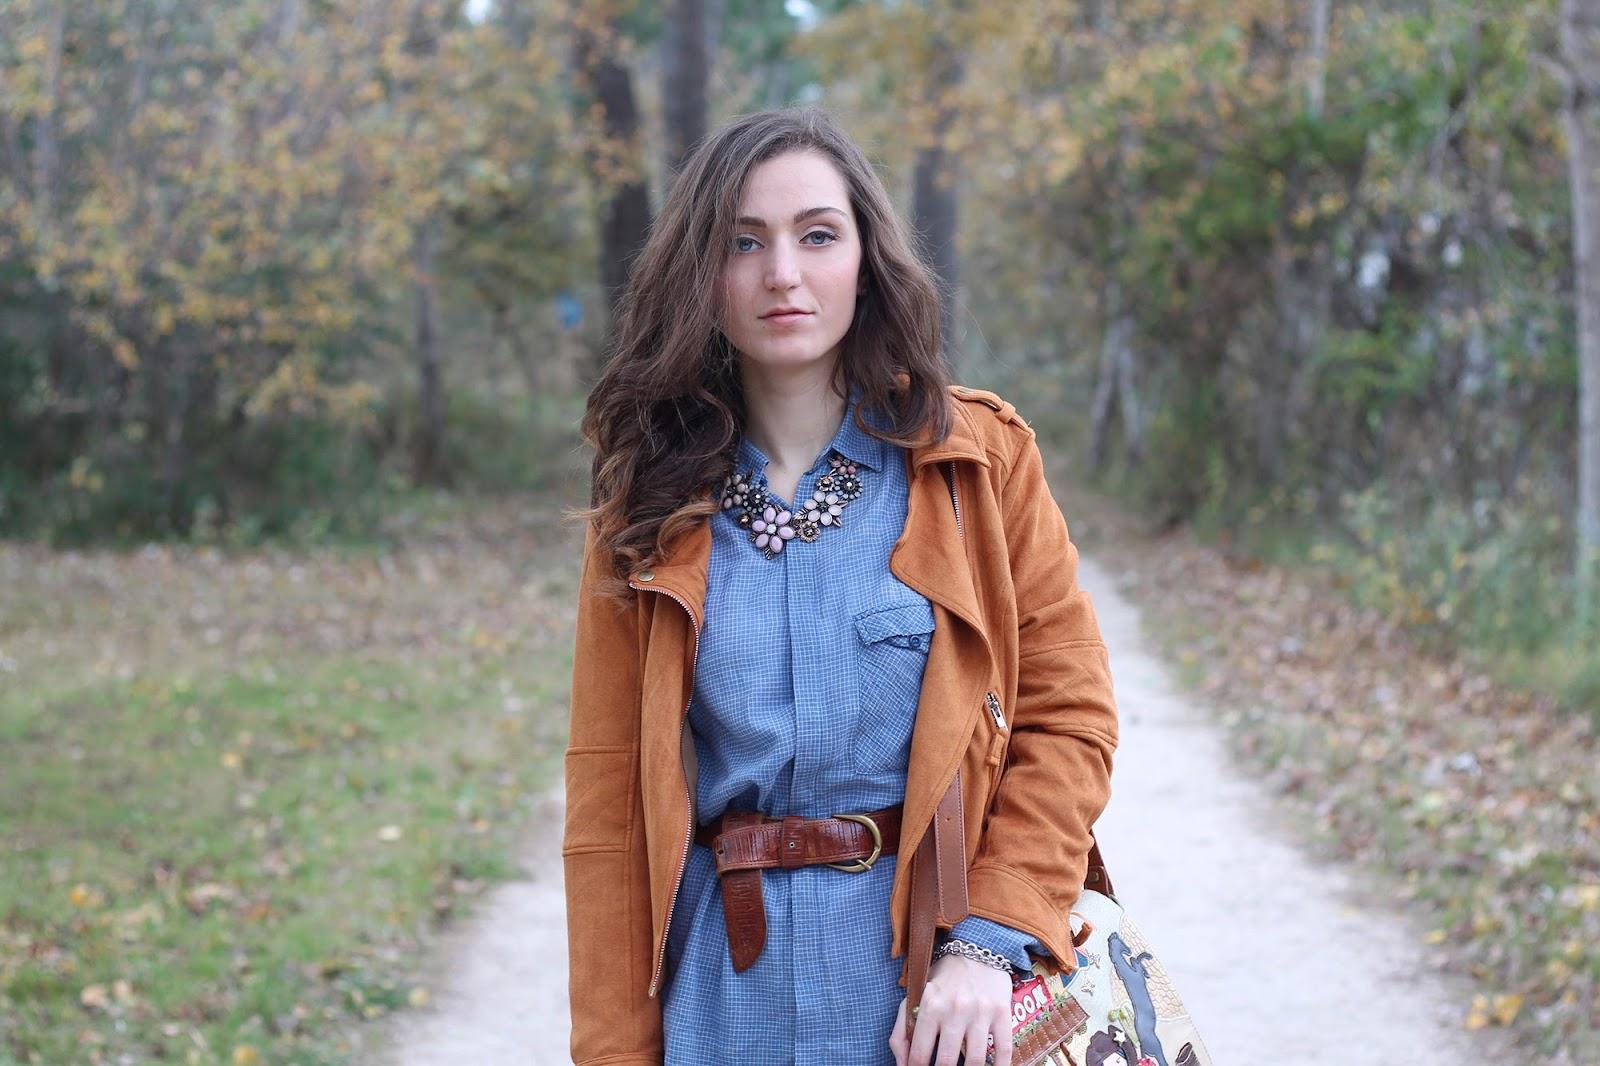 Stile indie giacca scamosciata e stivali con frange bow for Stile indie occidentale